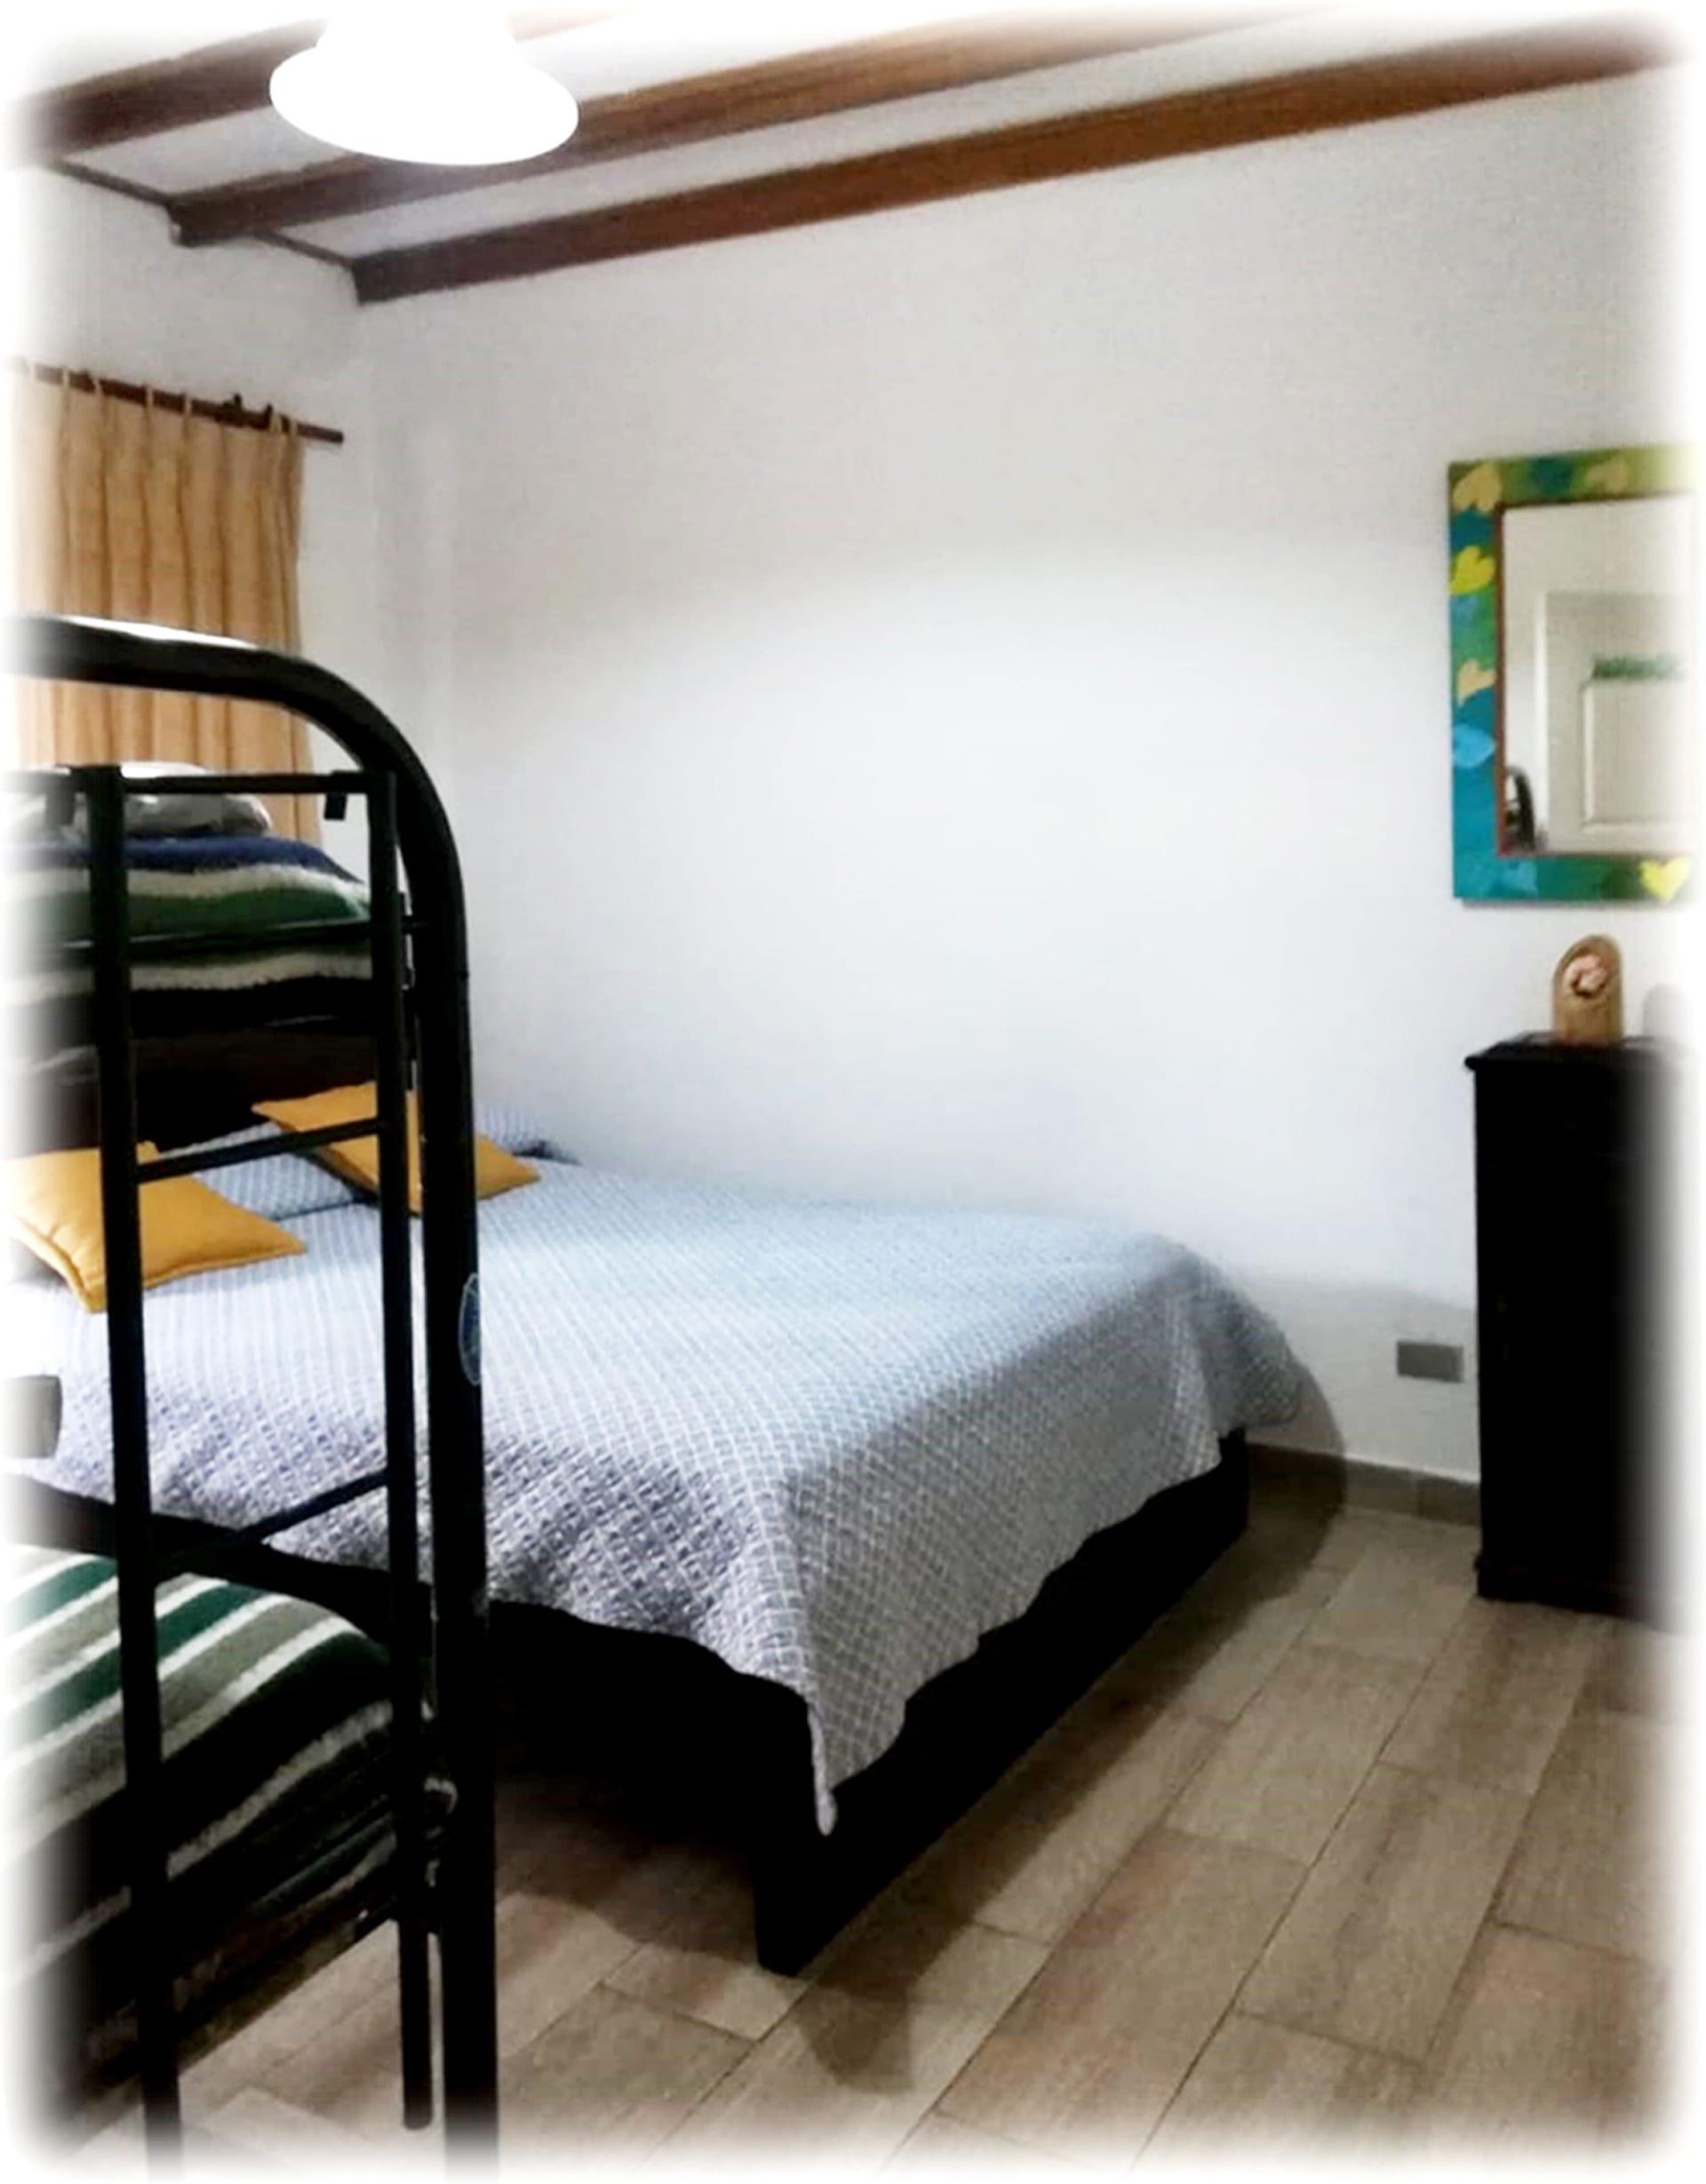 HOSTEL - Gaudy's Hostel